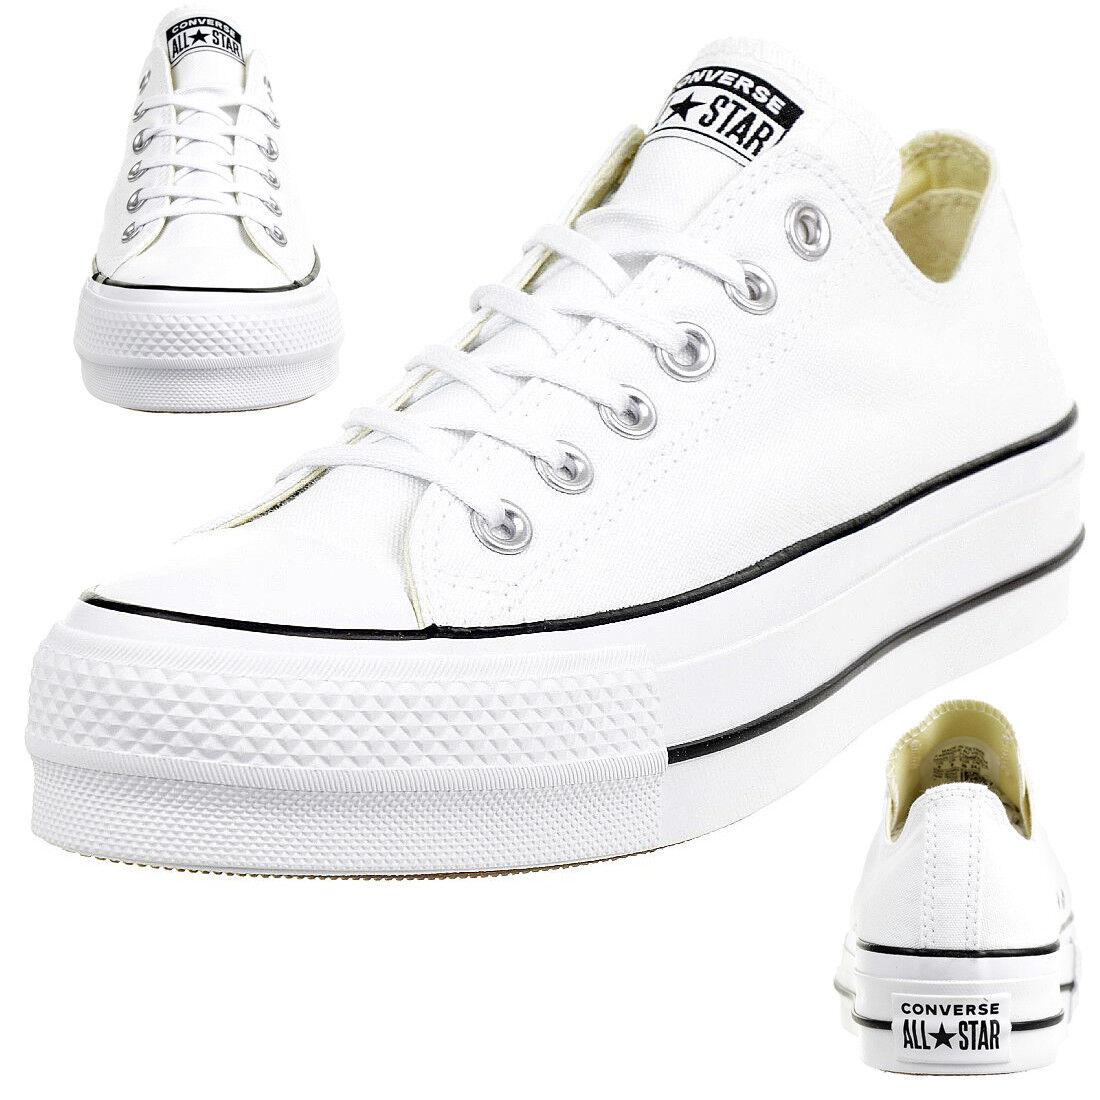 Converse C Taylor all Star Lift Ox Chuck Platform shoes Canvas White 560251c